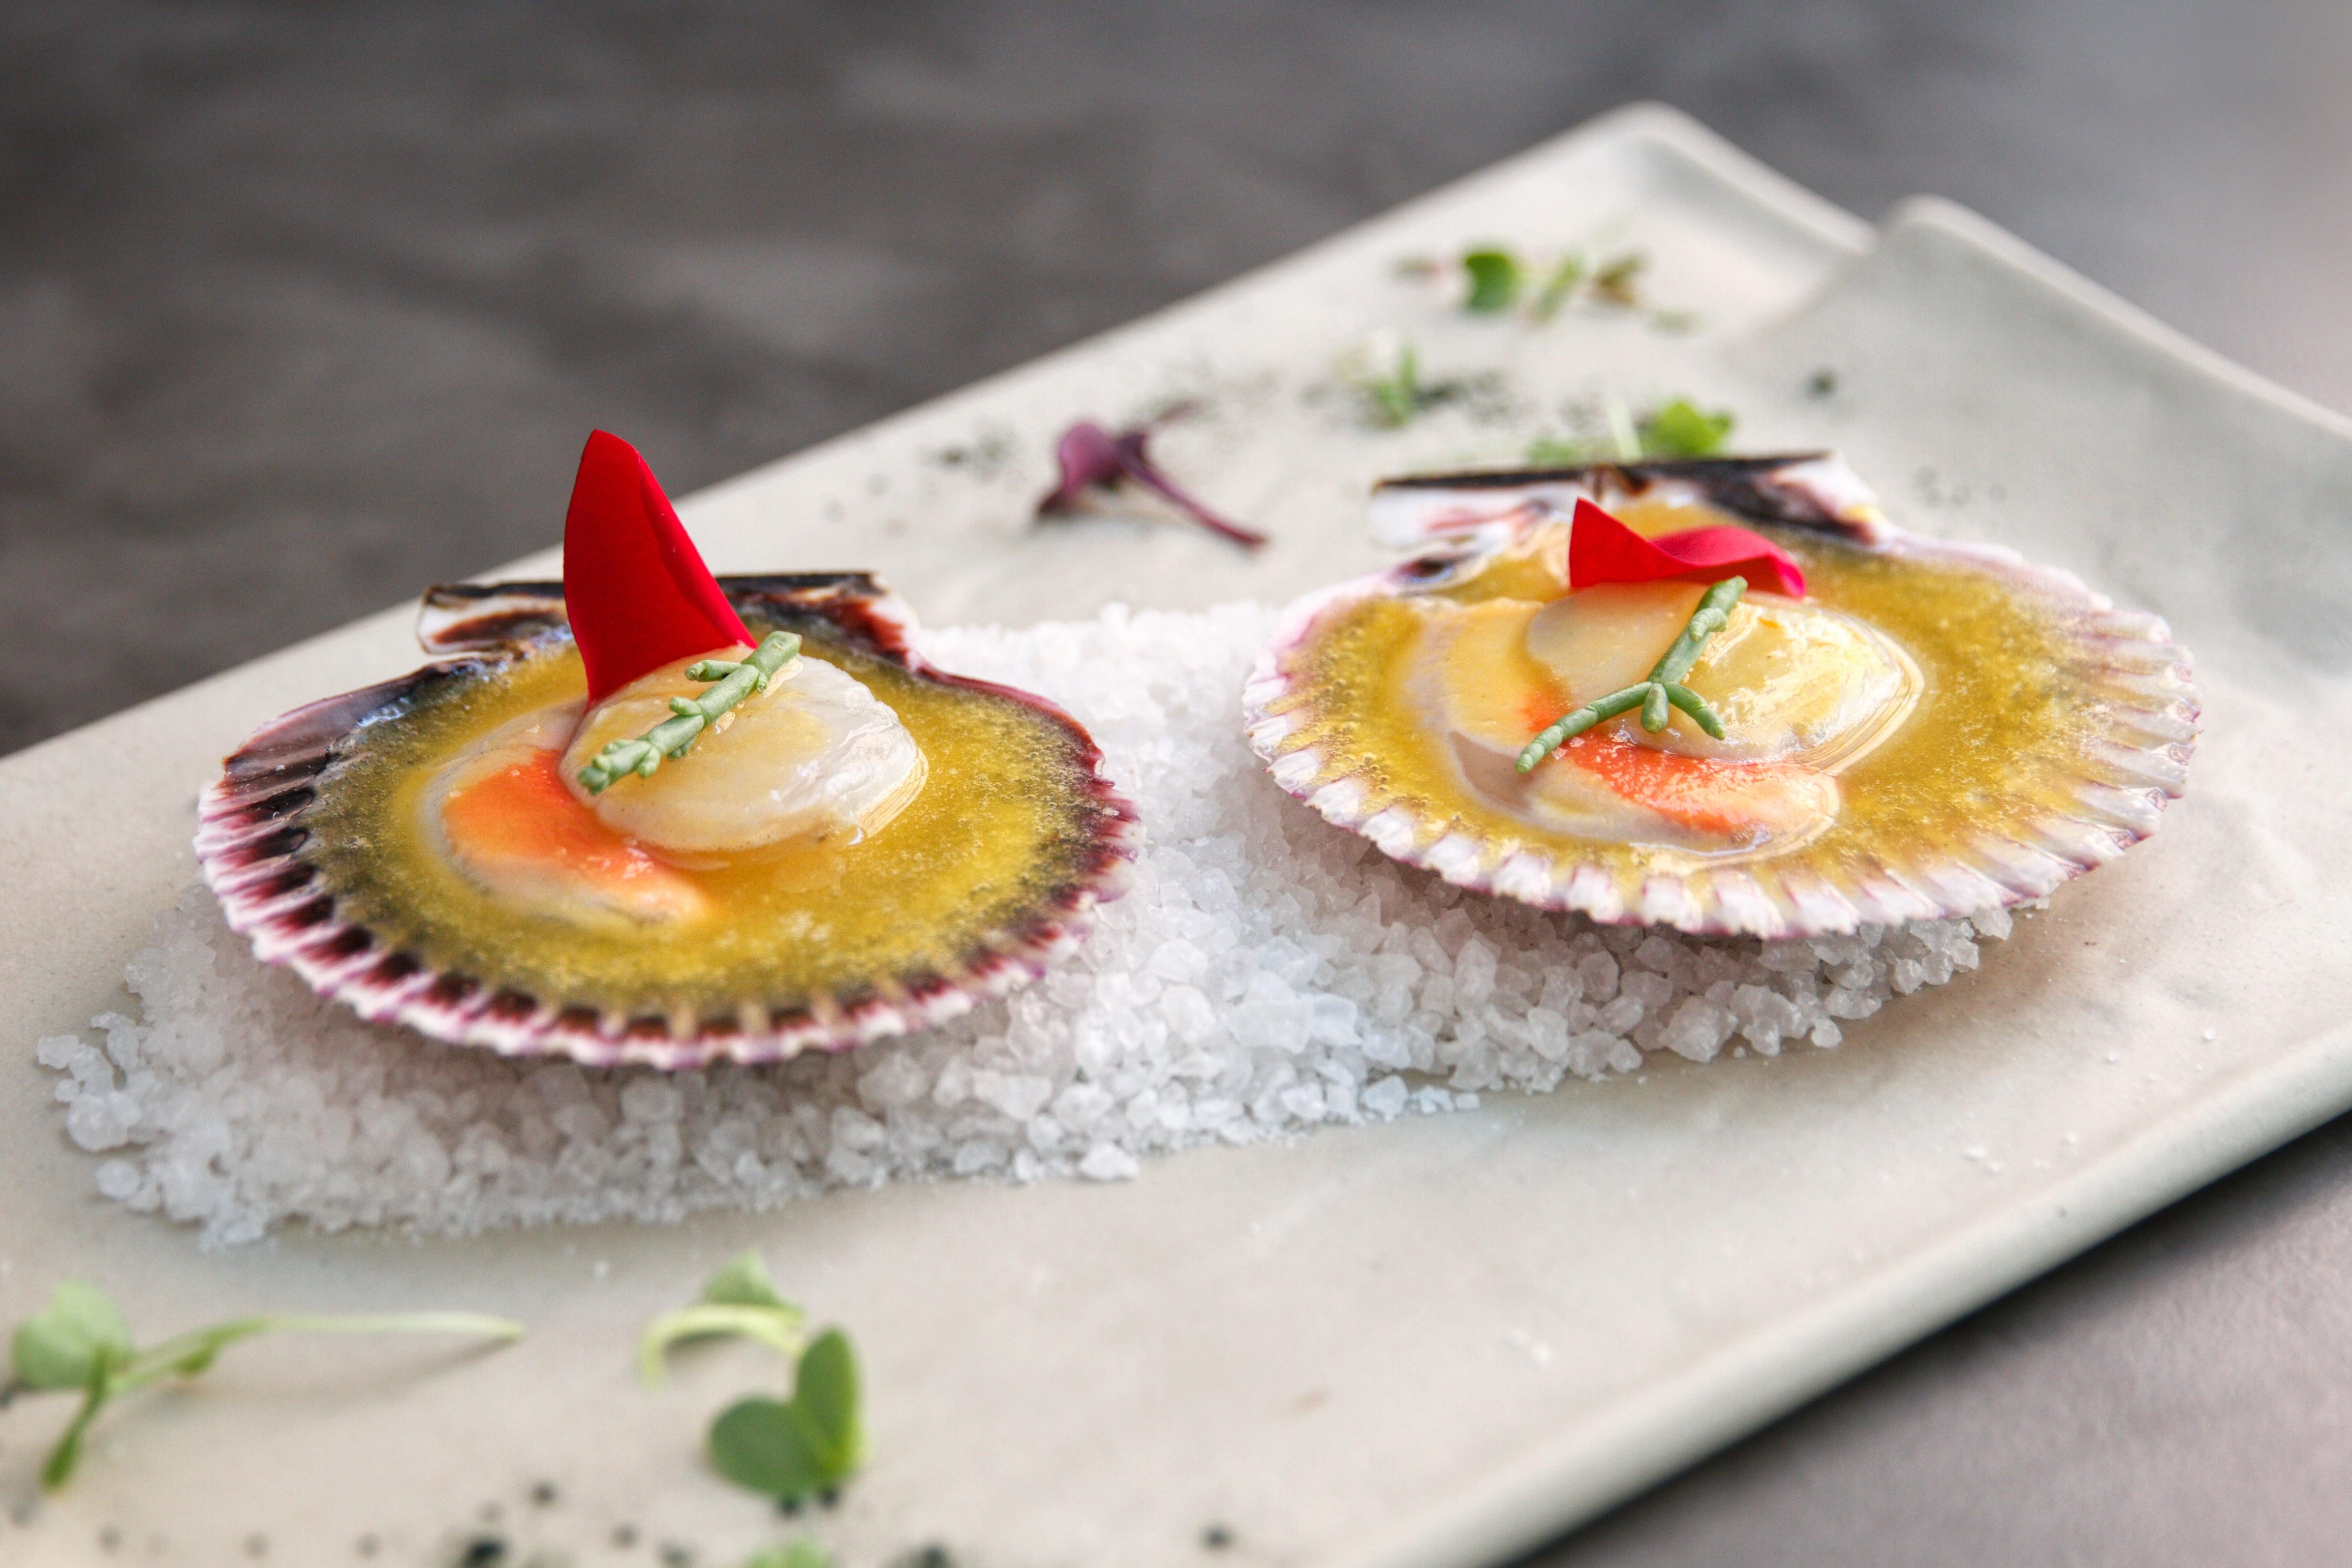 2. Para empezar - Ostión chileno, marinado con ají amarillo, jengibre y lemon grass (1)